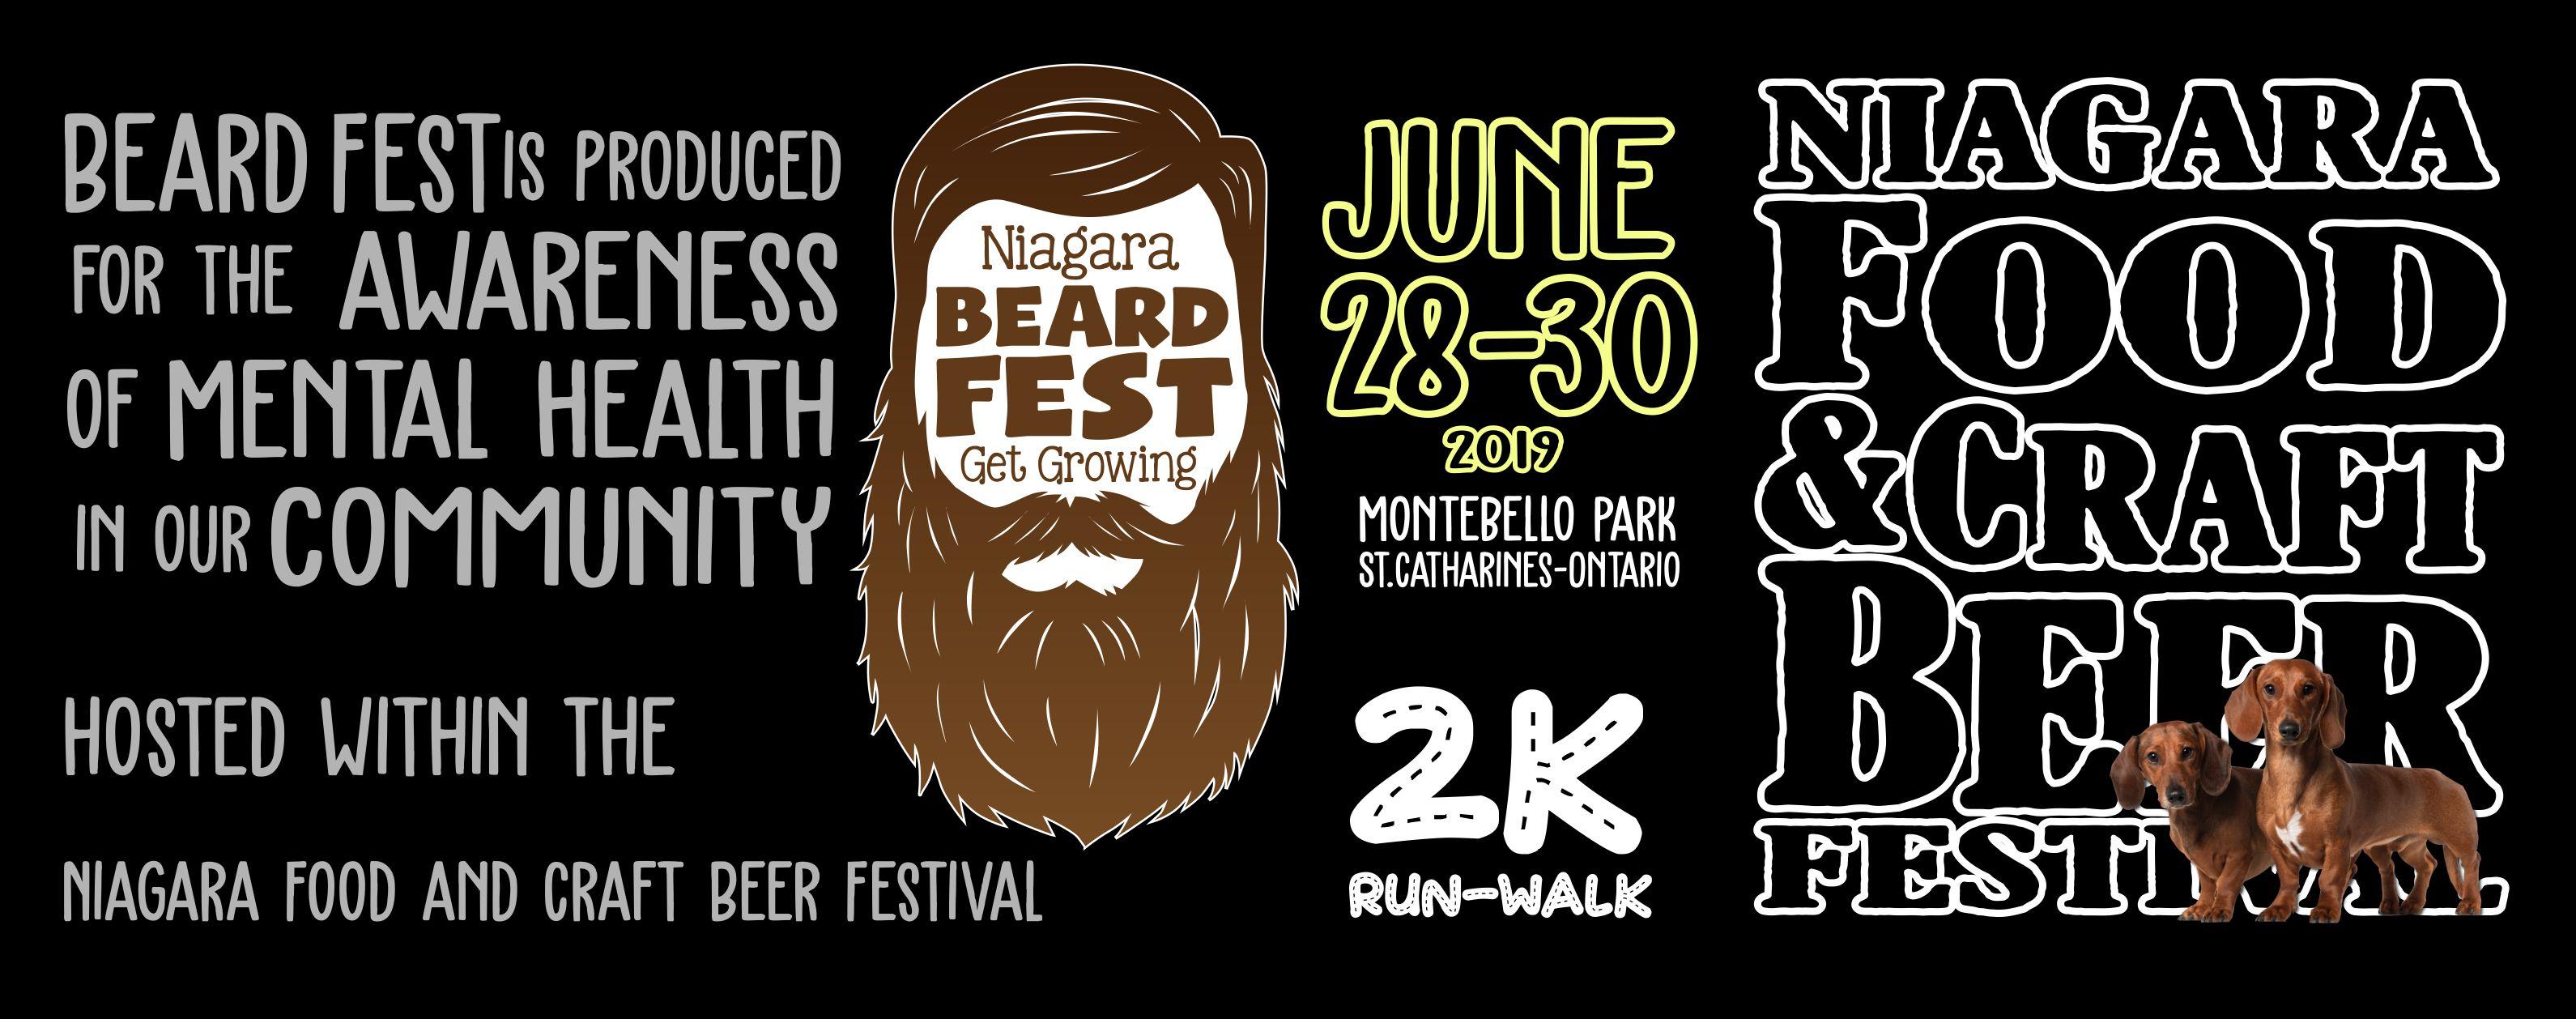 Beard Bare Foot Festivals – Family Shows Canada